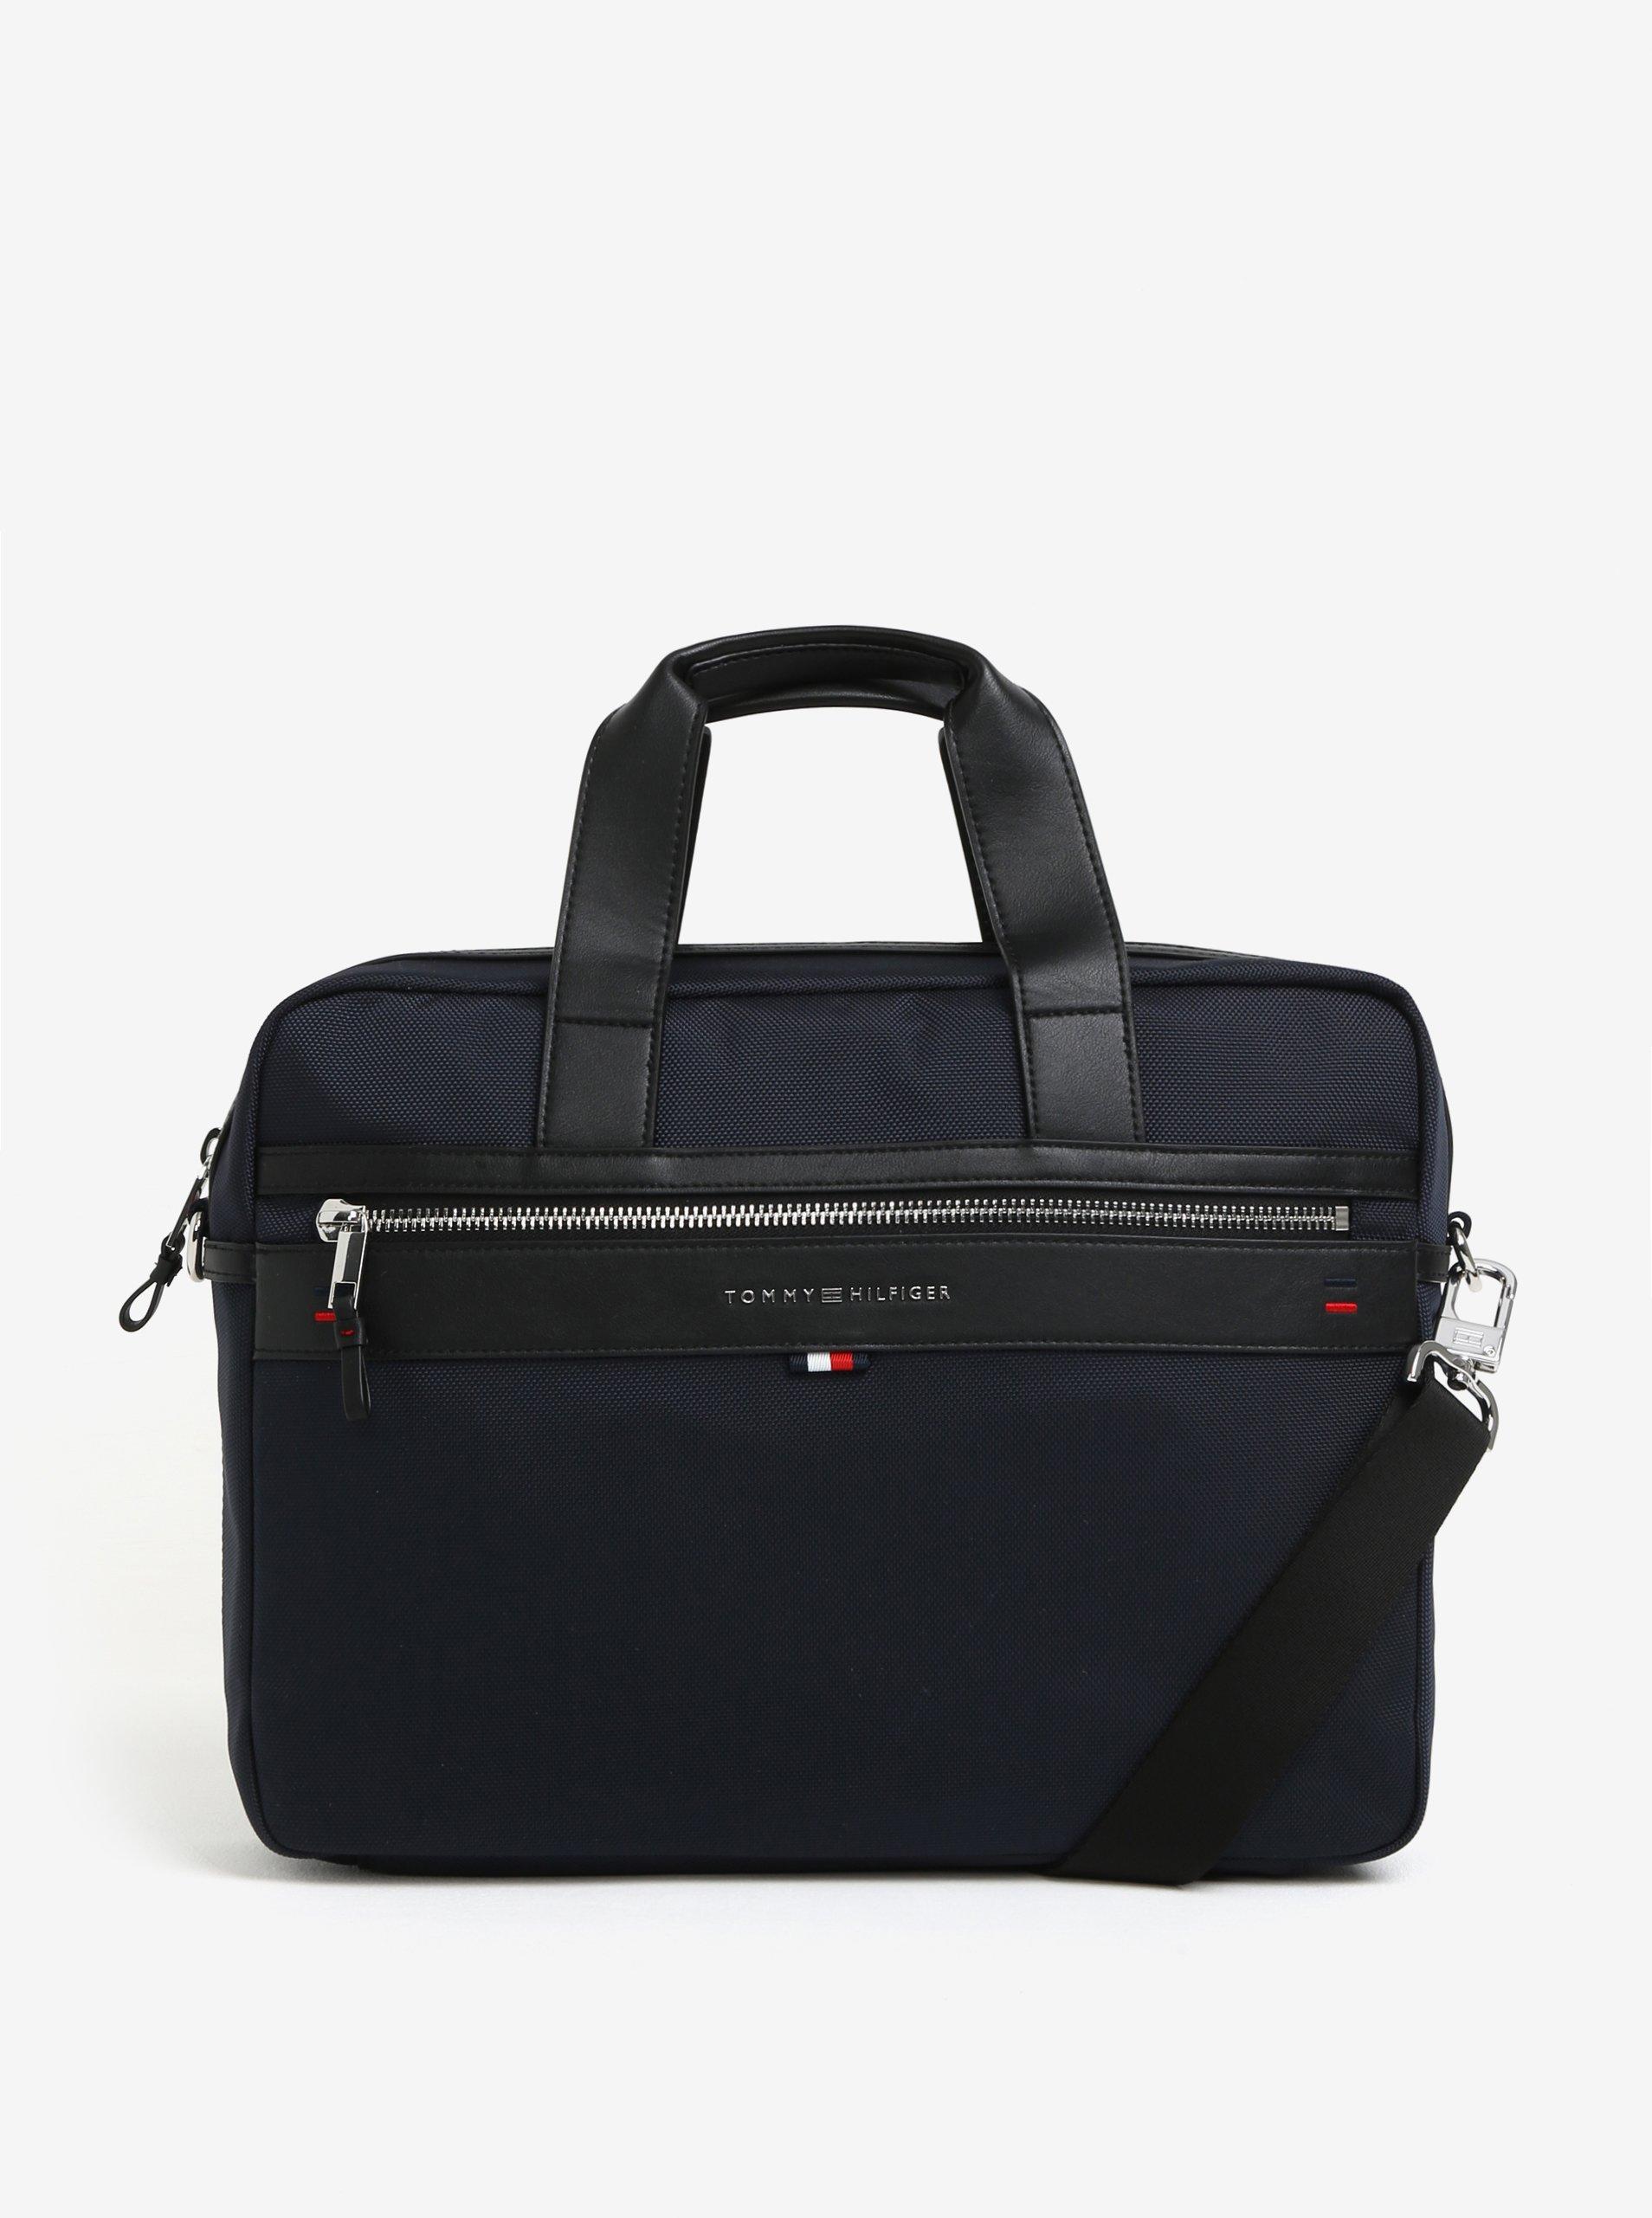 f025dc0275 Tmavomodrá pánska taška na notebook Tommy Hilfiger Elevated